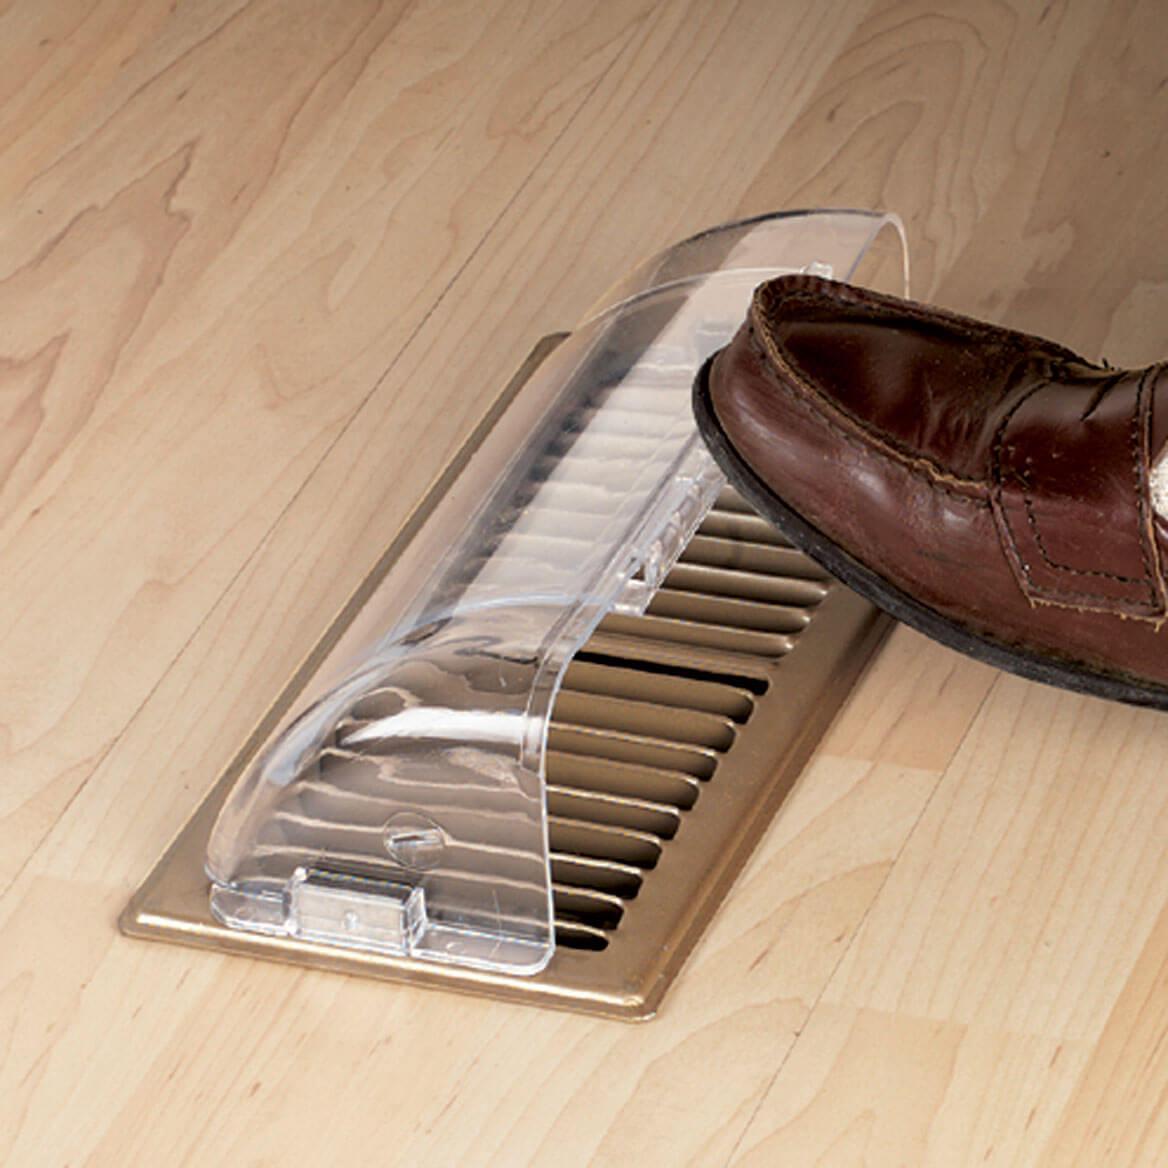 floor vent deflector - furnace vent deflector - miles kimball